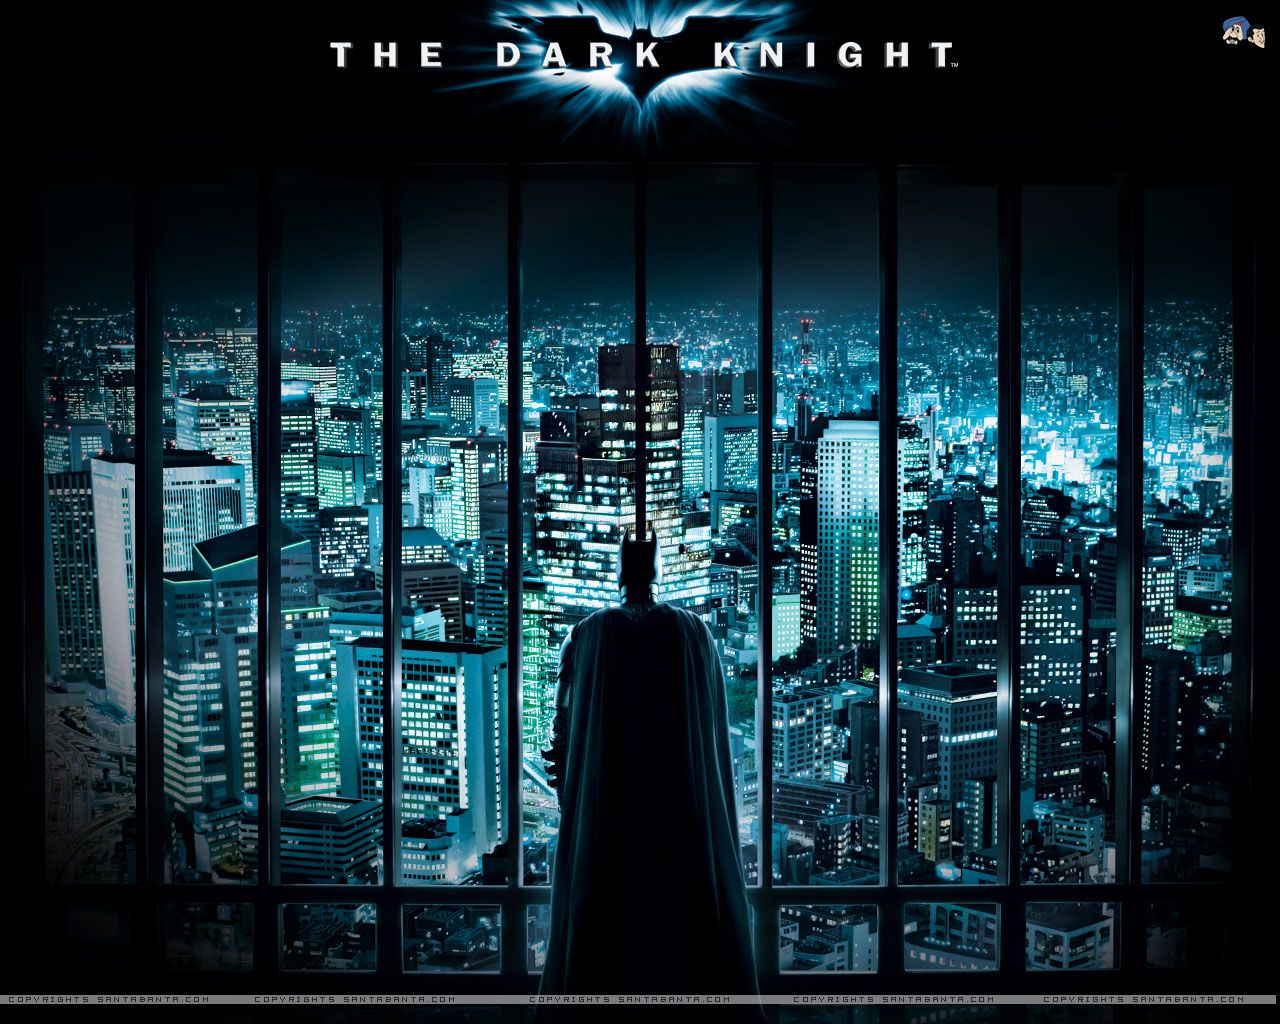 http://3.bp.blogspot.com/-5c6BePsysww/TjJICa335EI/AAAAAAAAADA/uMRV9Yl8x4k/s1600/The_Dark_Knight_2.jpg